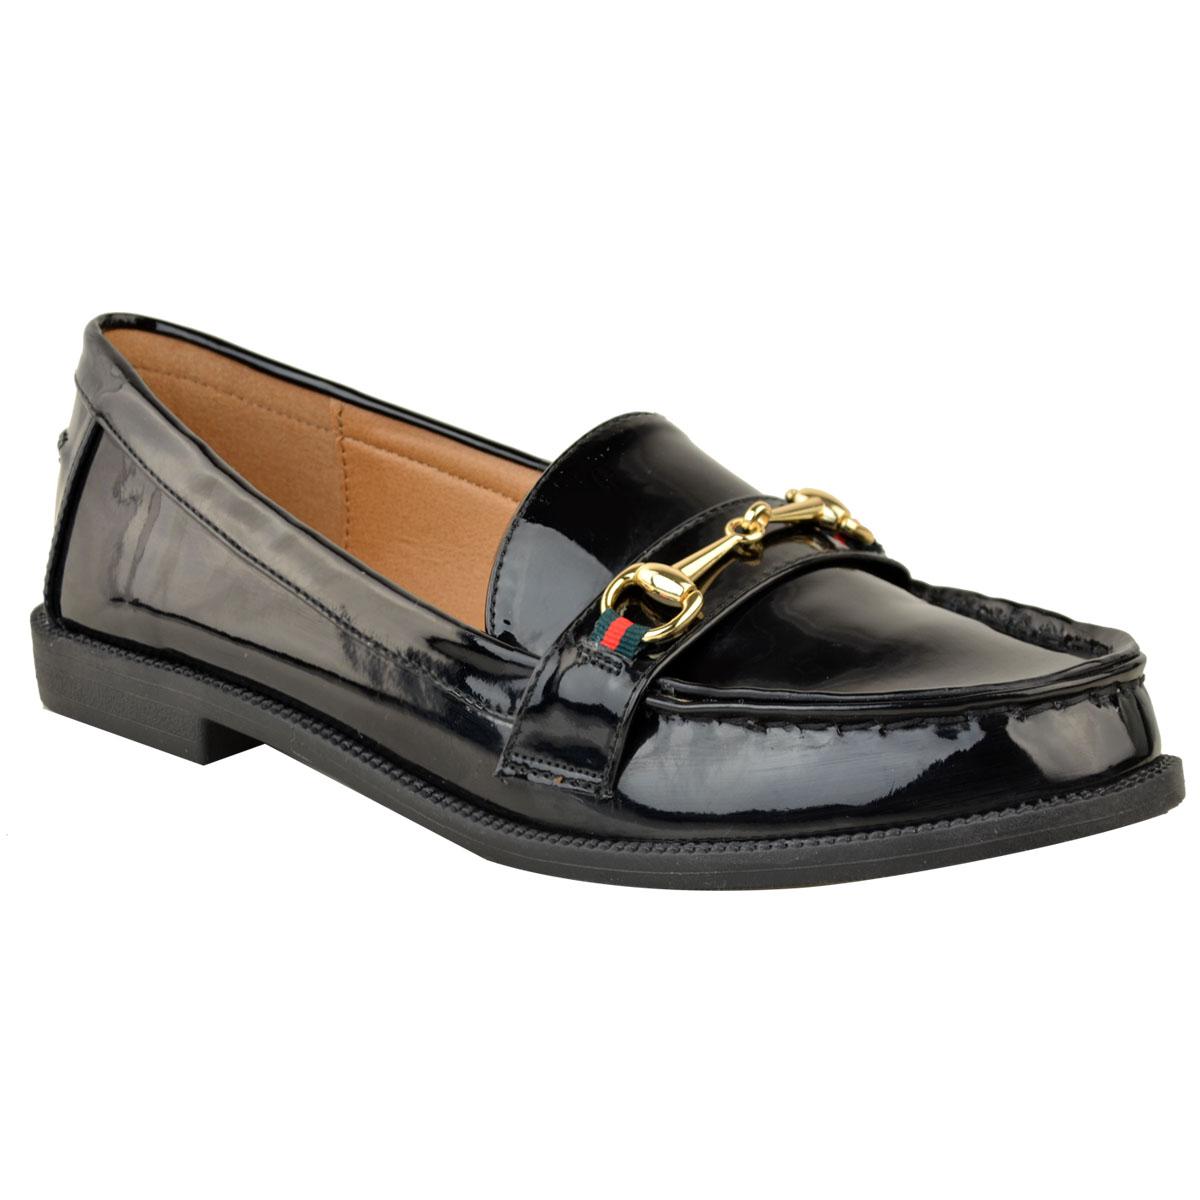 01e4ab9519c Womens Ladies New Flat Horsebit Loafers School Shoes Designer Smart ...